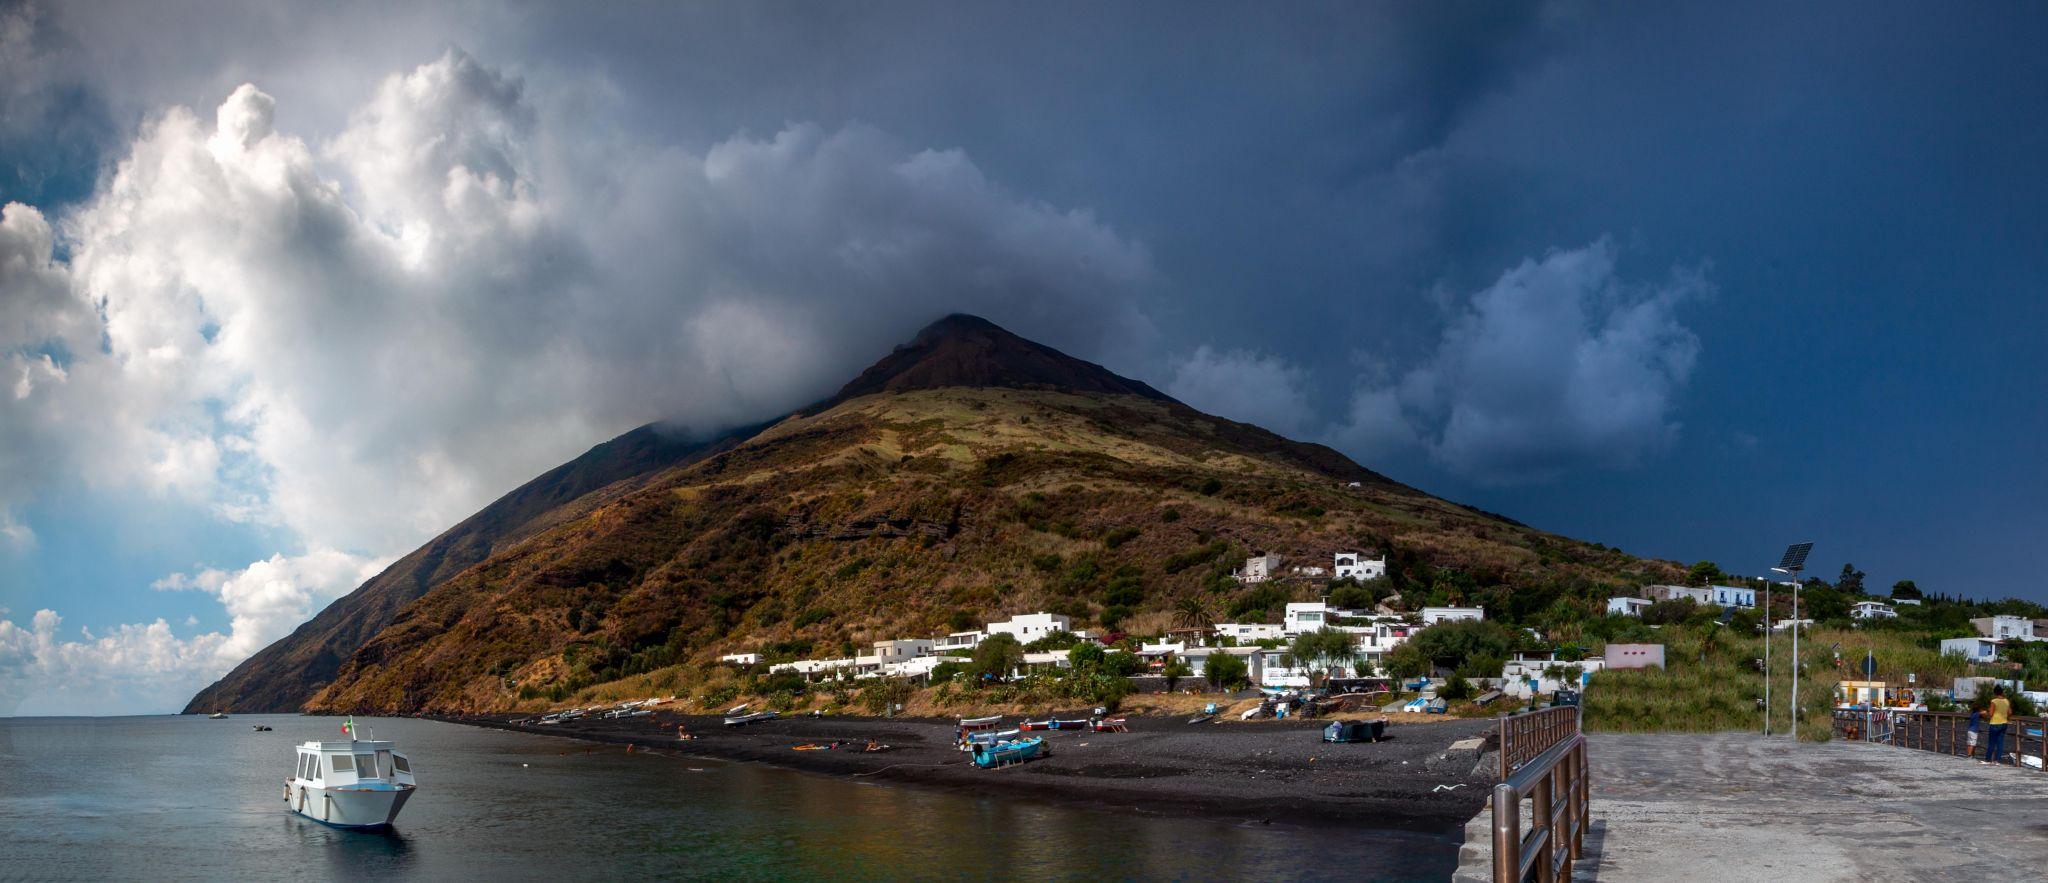 The Island of Stromboli, Aeolian Islands, Italy